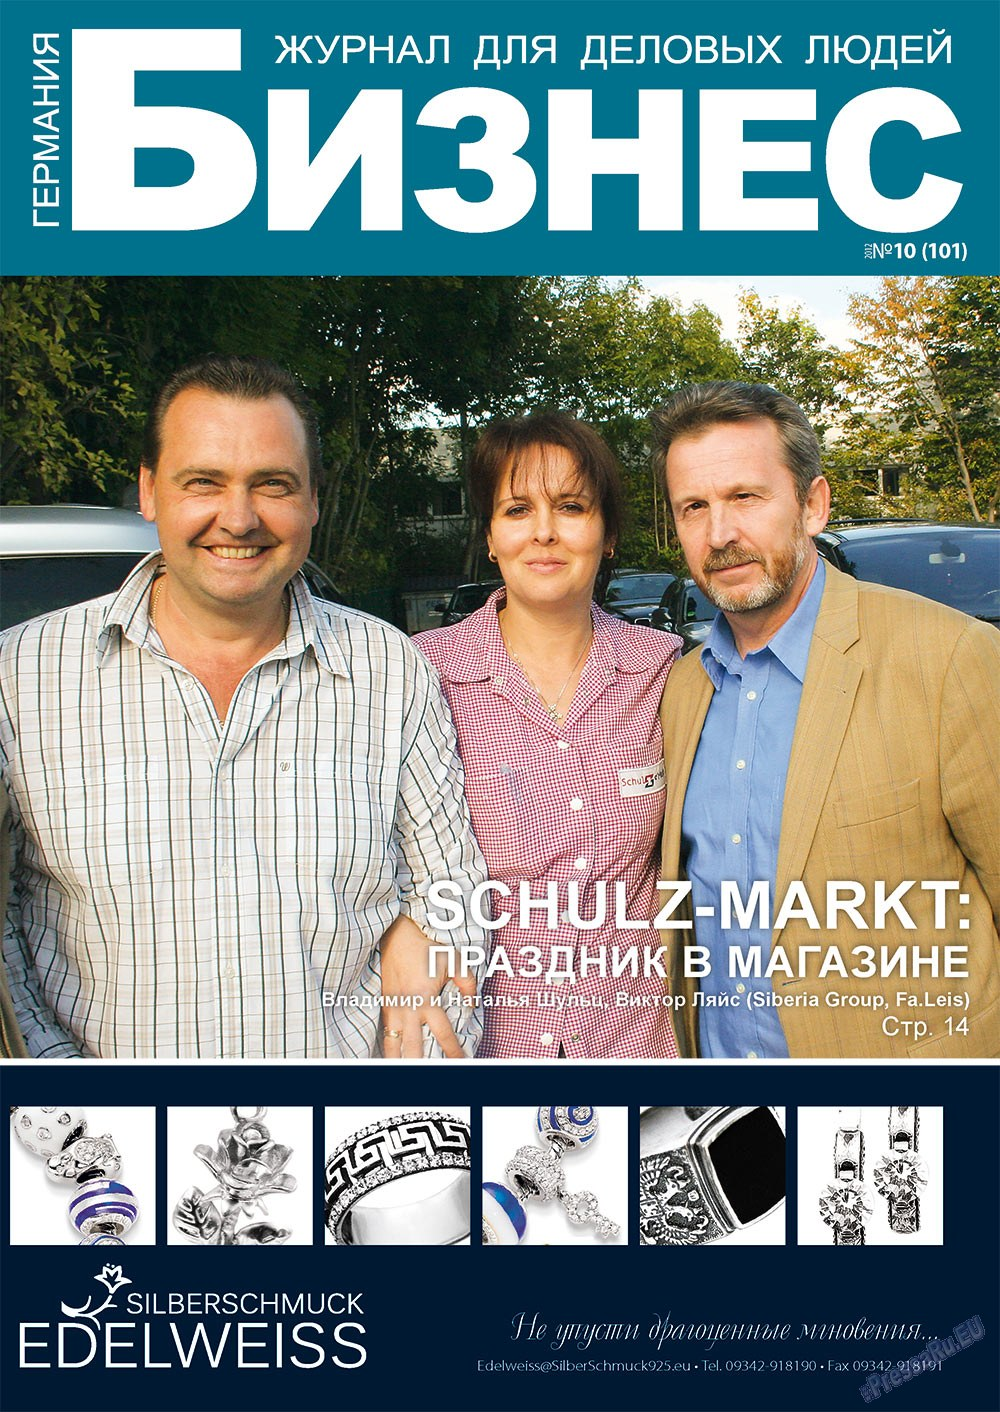 Бизнес (журнал). 2012 год, номер 10, стр. 1